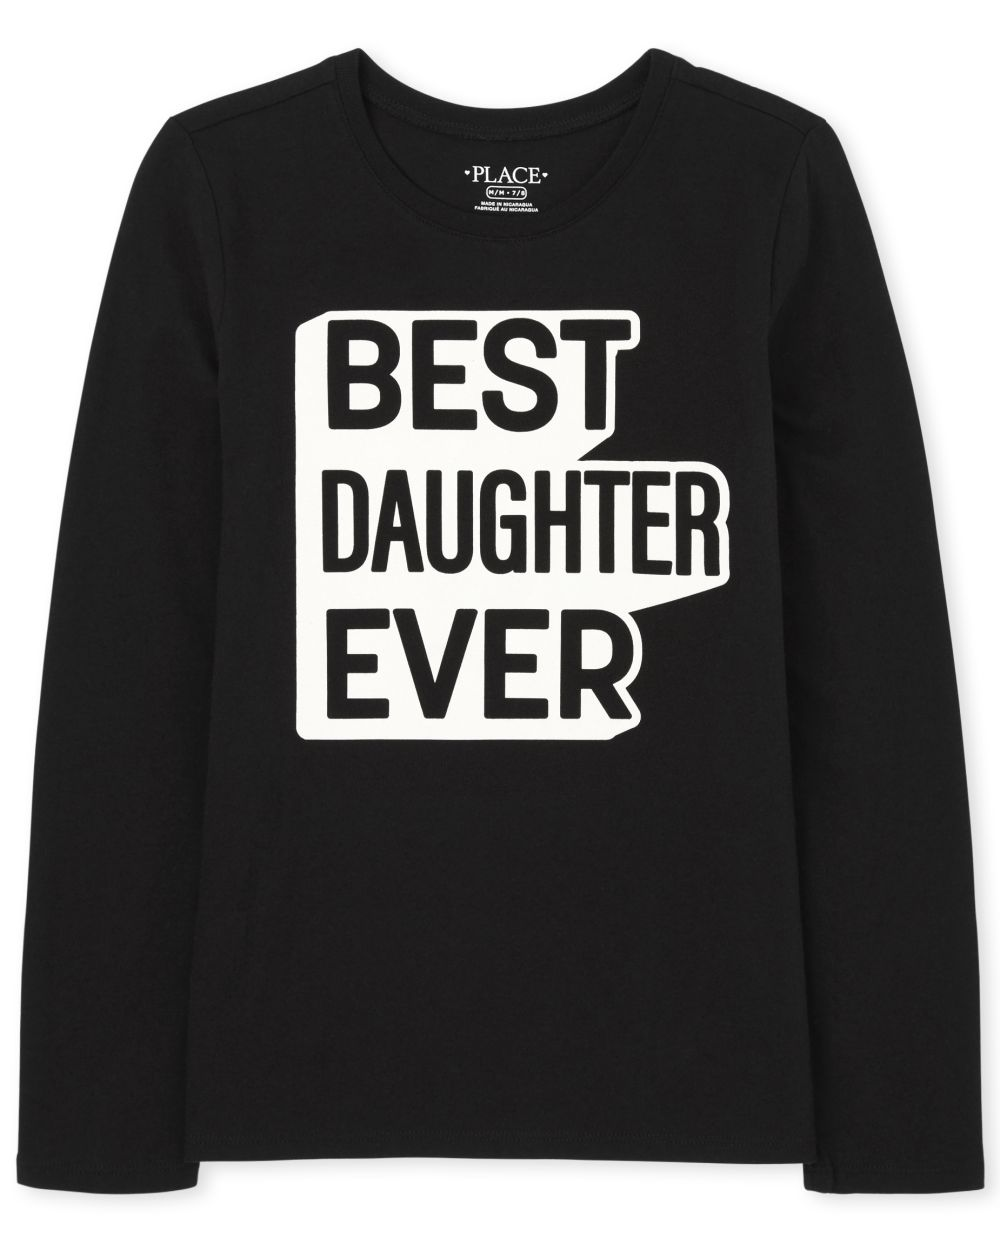 Girls Matching Family Daughter Graphic Tee - Black T-Shirt